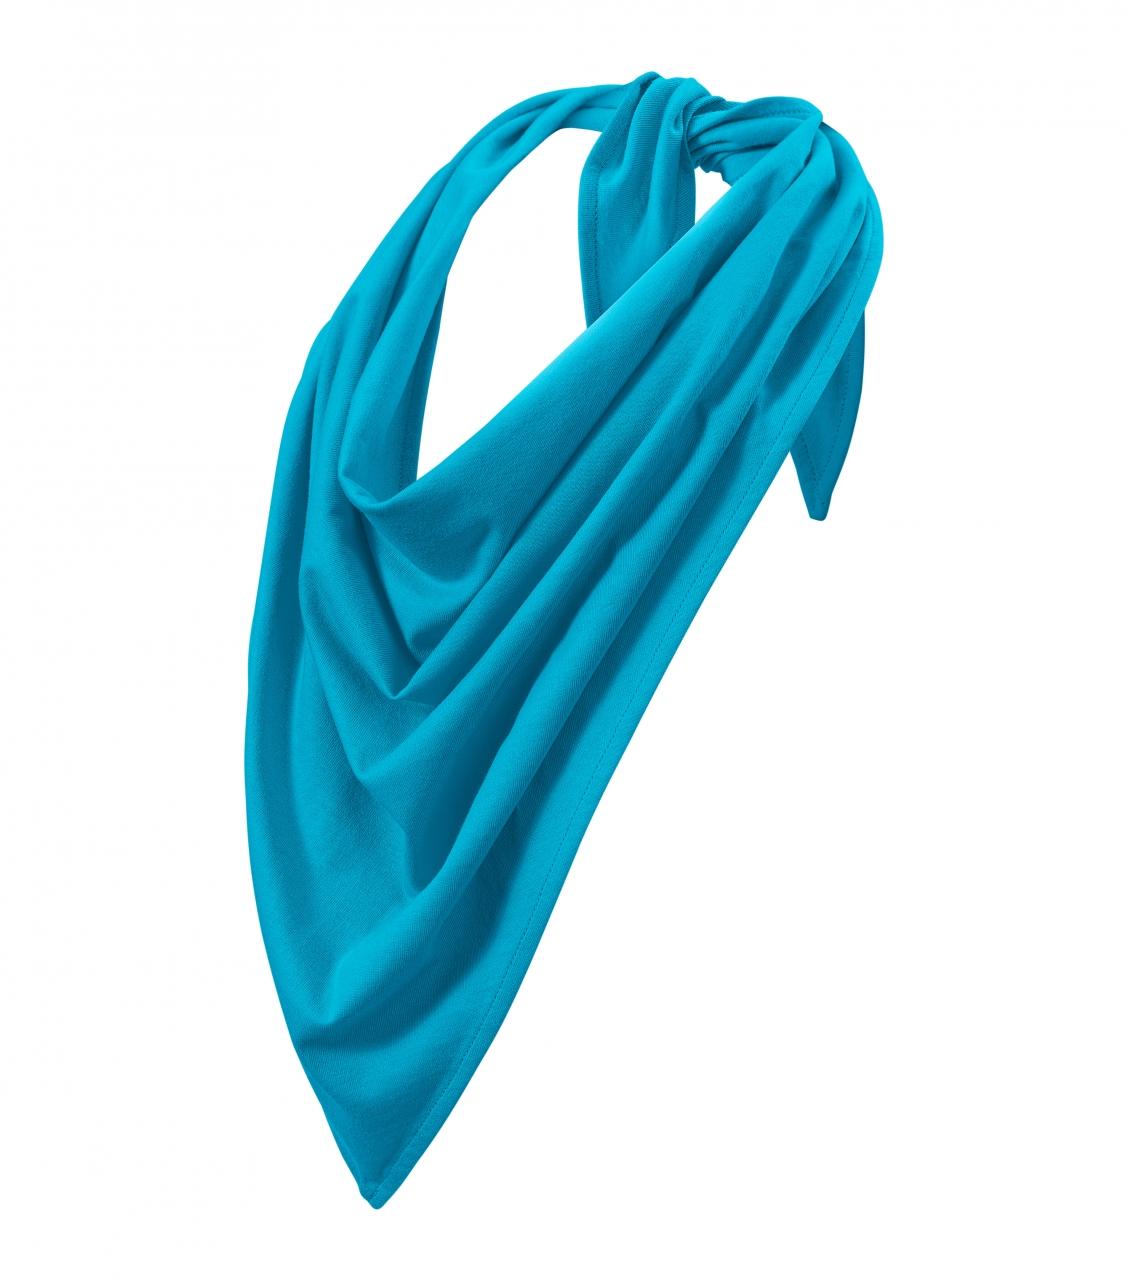 Šátek Adler Fancy - modrý